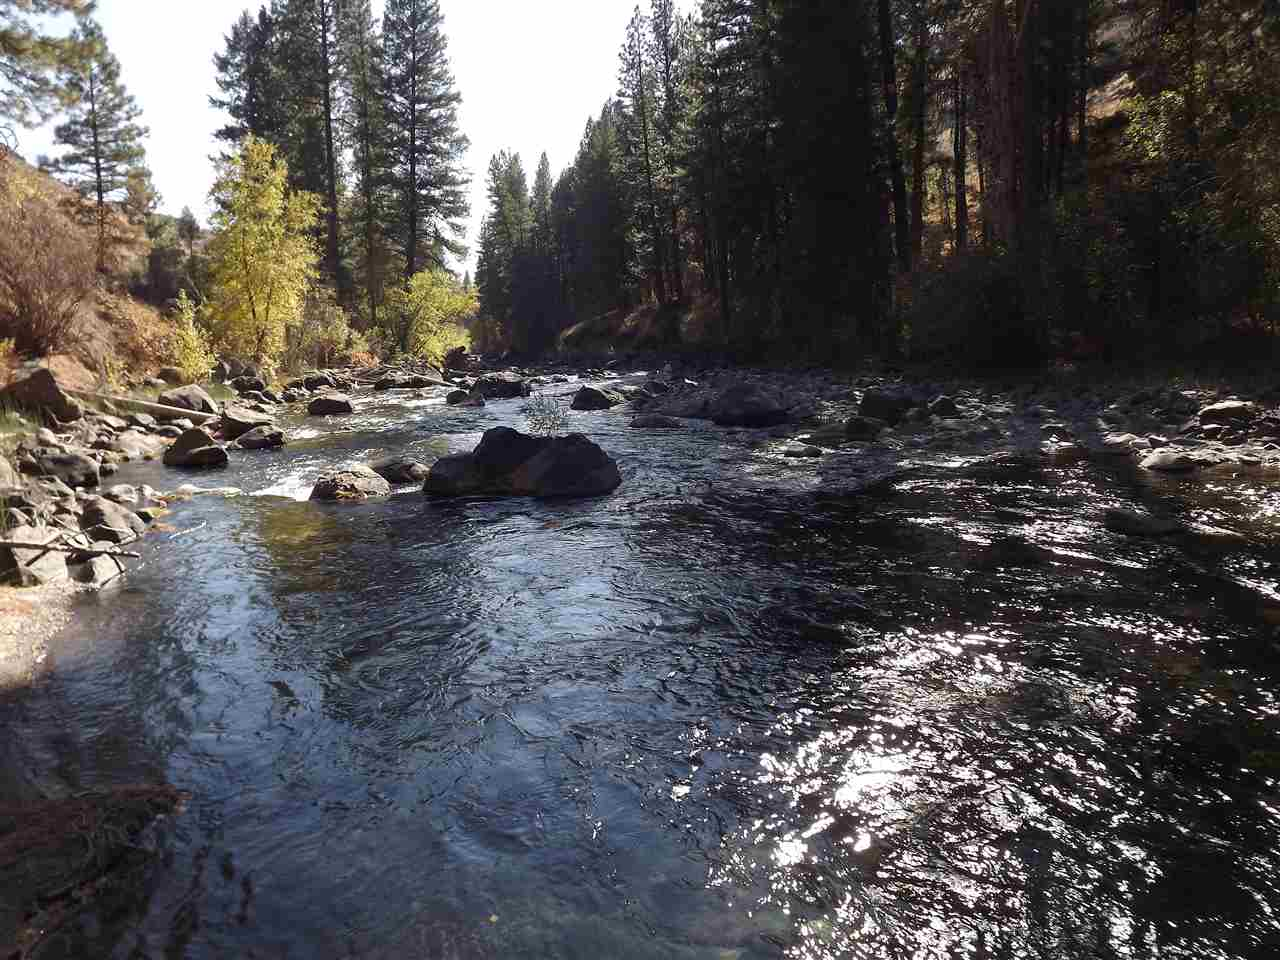 Recreational Property for Sale at Eagle Creek Road Eagle Creek Road Richland, Oregon 97870